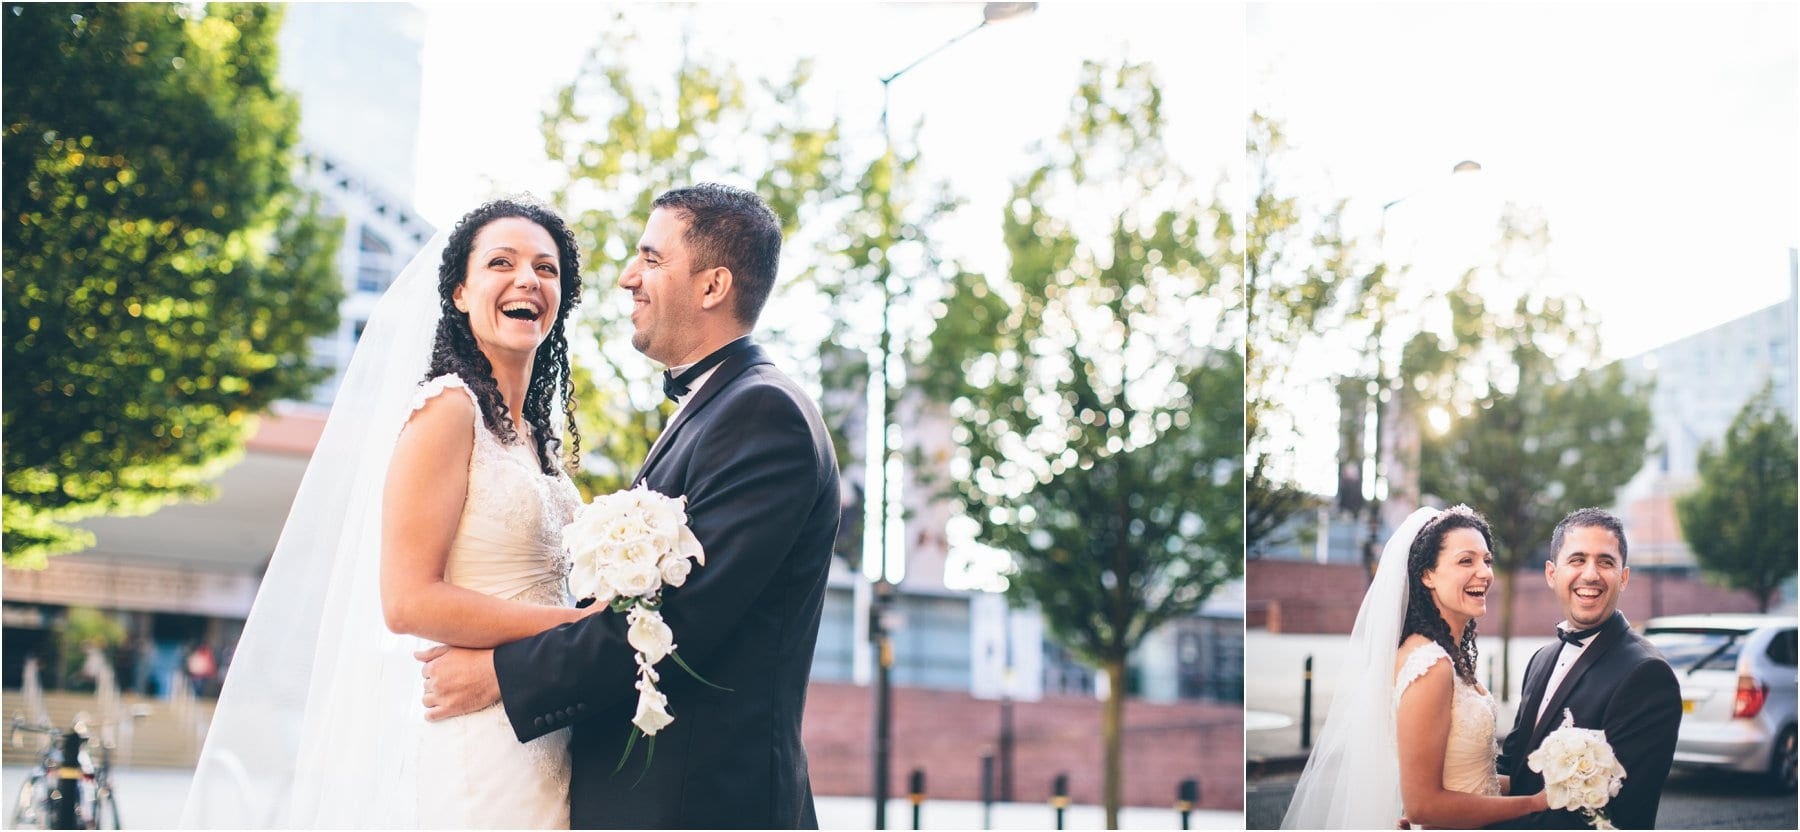 Midland_Manchester_Wedding_Photography_0093